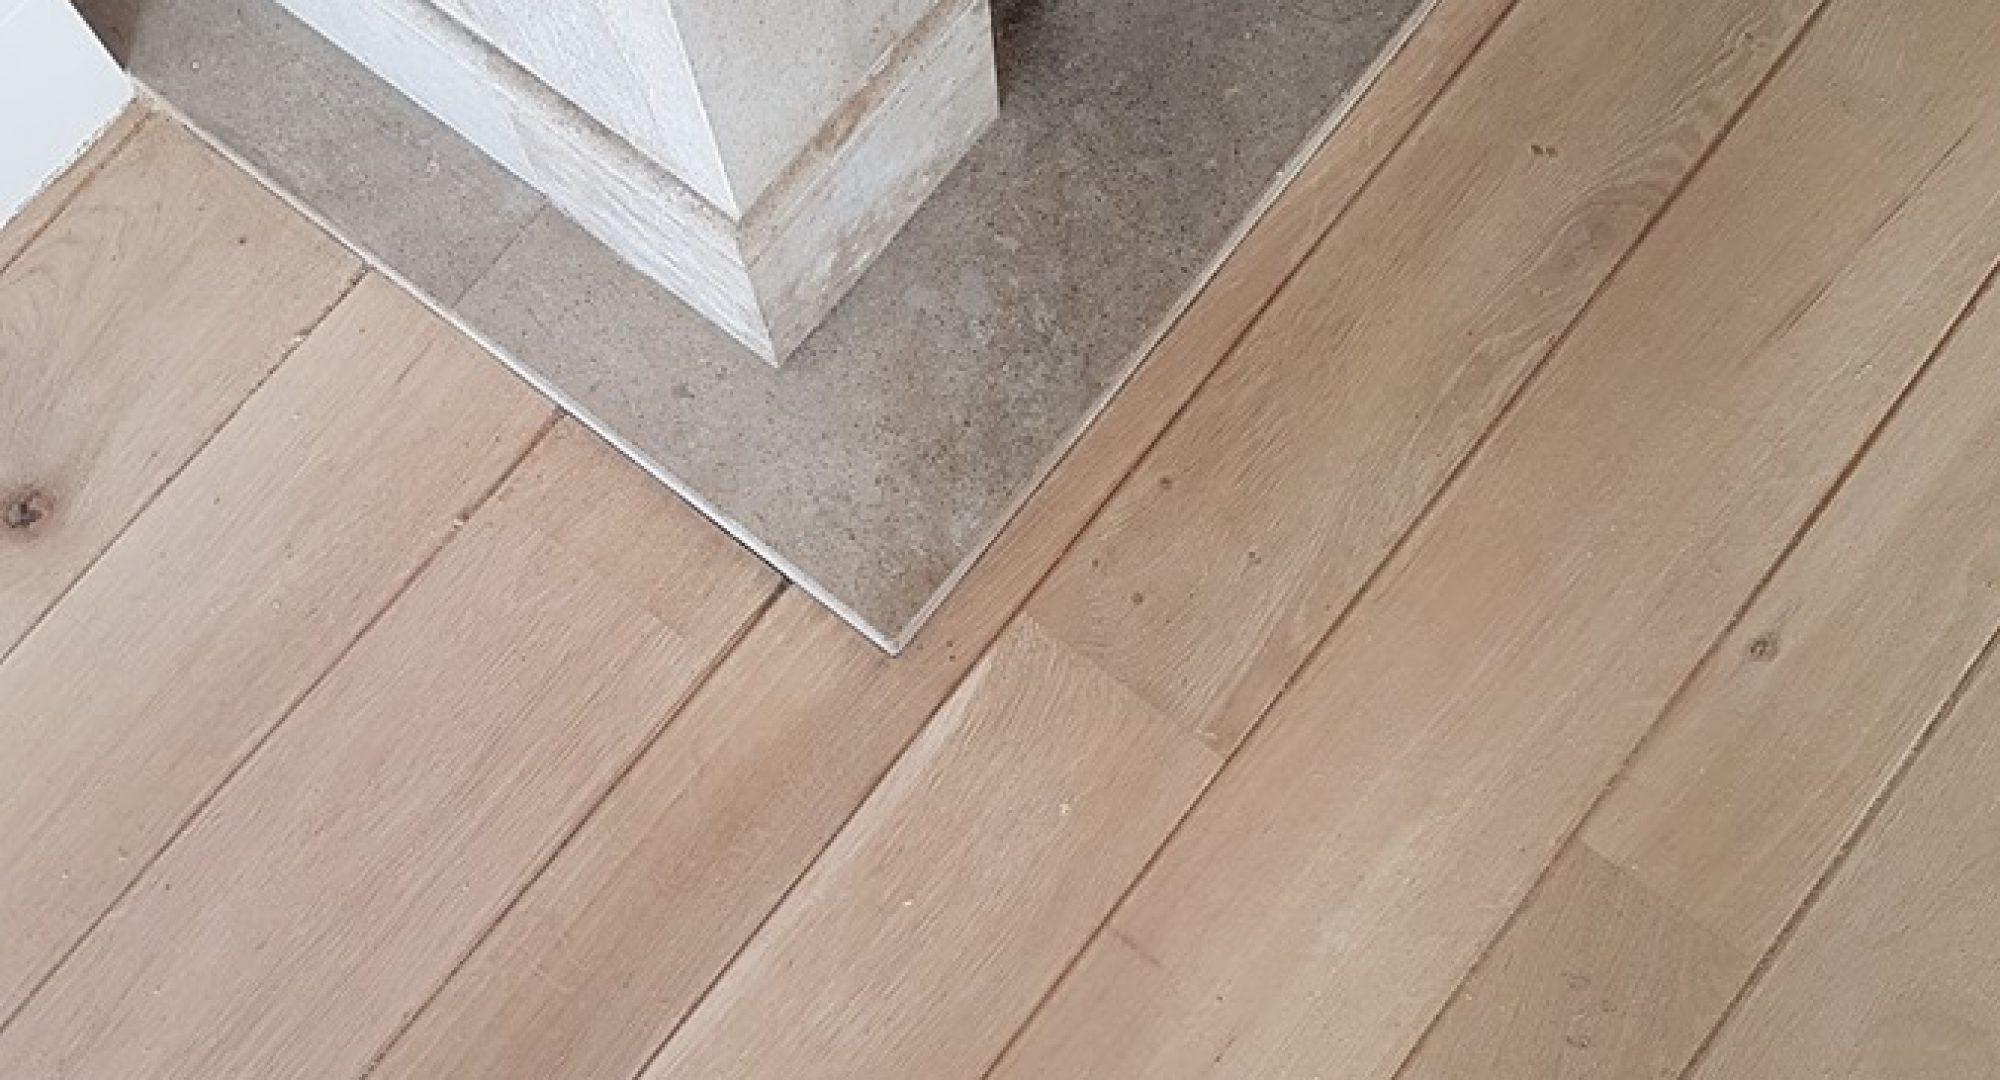 Houten vloer schuren prijs v.a u20ac745 incl naturel of whitewash